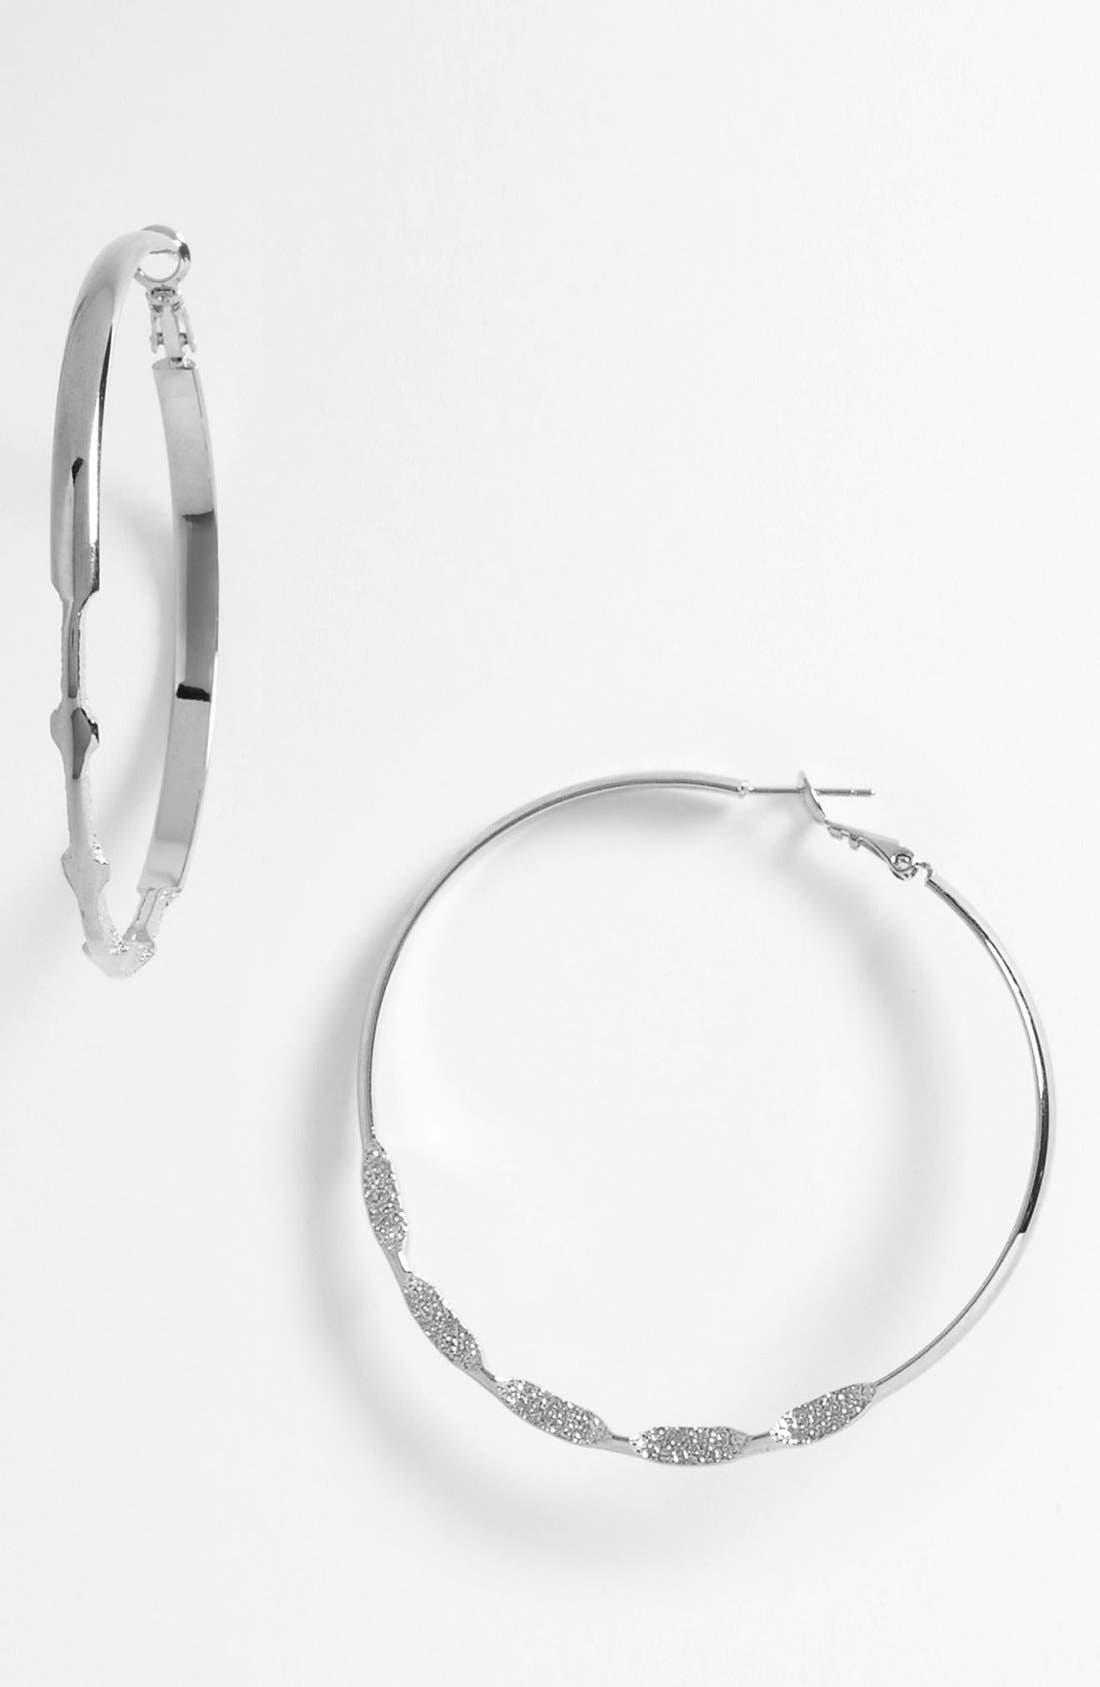 Main Image - Natasha Couture Etched Hoop Earrings